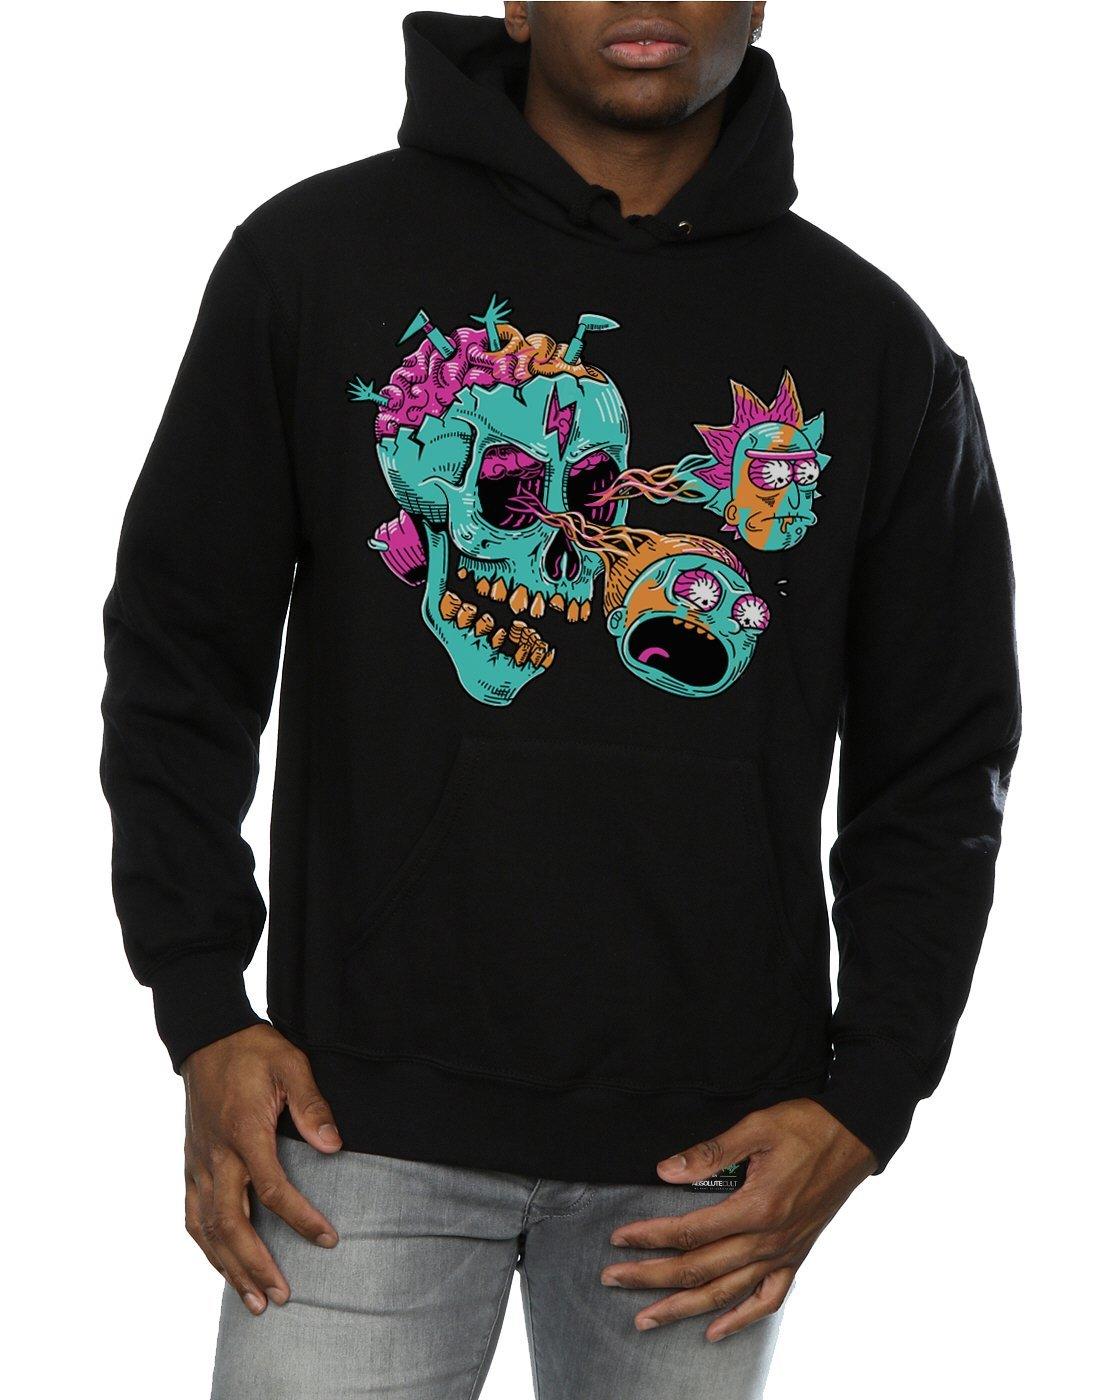 Rick and Morty: Eyeball Skull Hoodie (Large) image